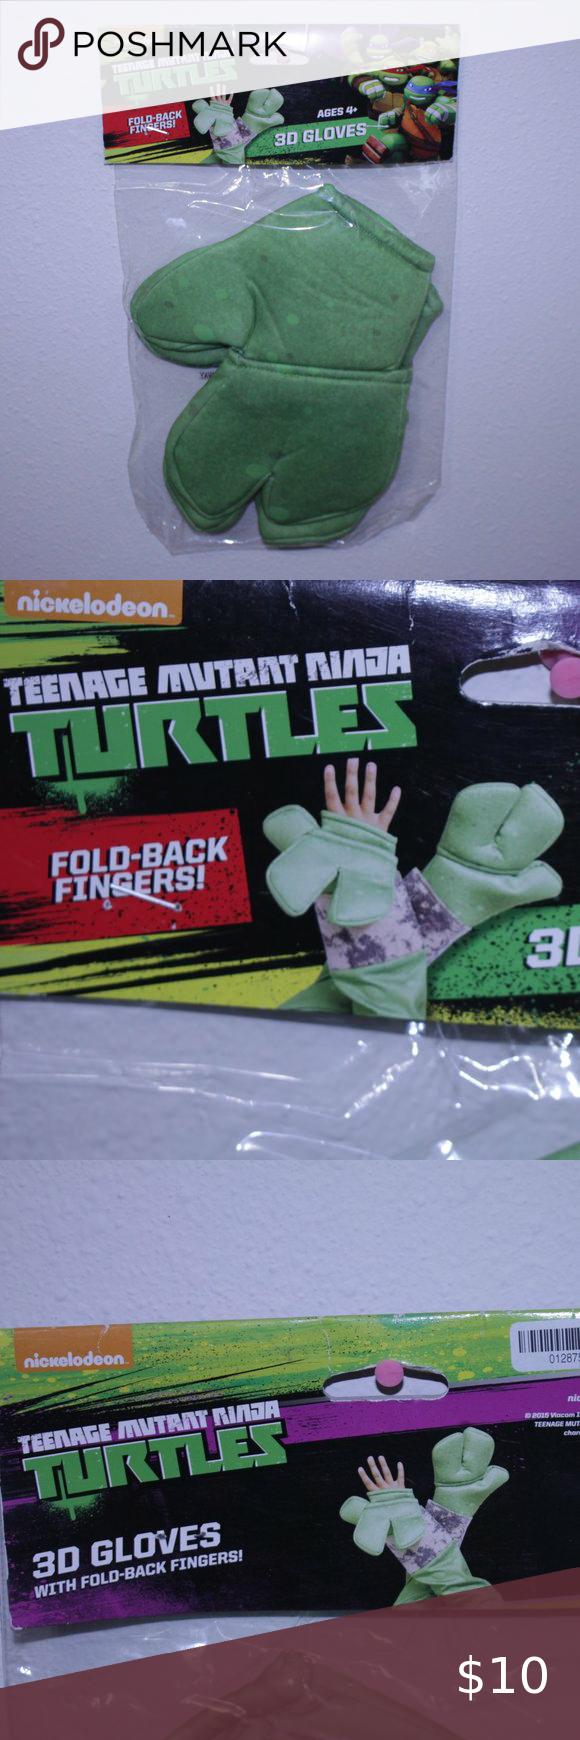 2020 Halloween Costumes Nickelodeon Teenage Mutant Ninja Turtles Kids Nickelodeon Teenage Mutant Ninja Turtle Glove in 2020